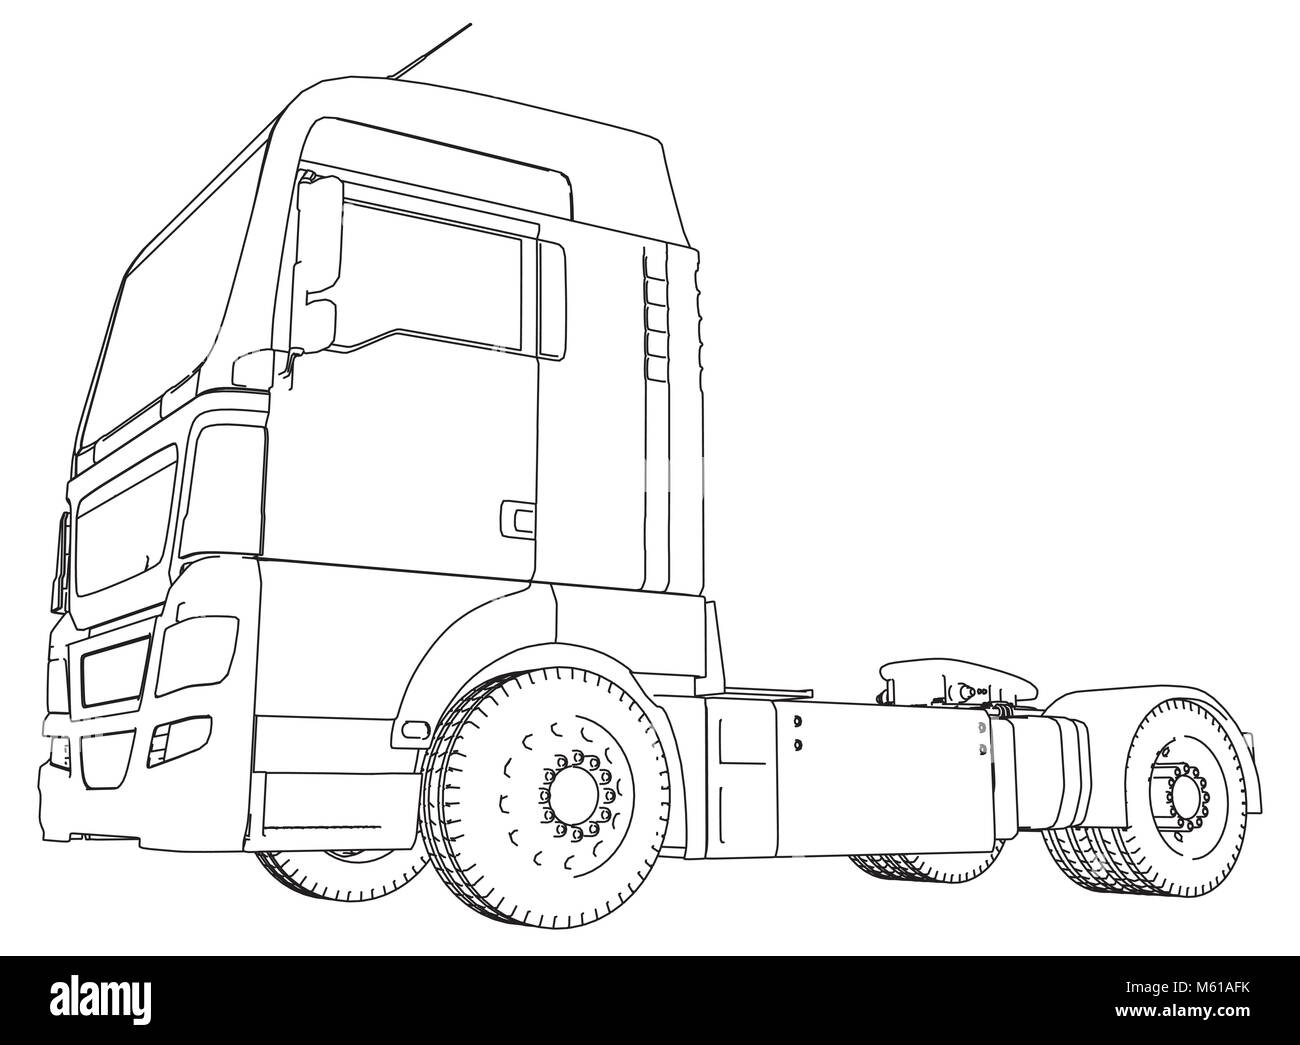 modern cargo truck isolated on grey background eurotrucks delivering M61AFK modern cargo truck isolated on grey background eurotrucks